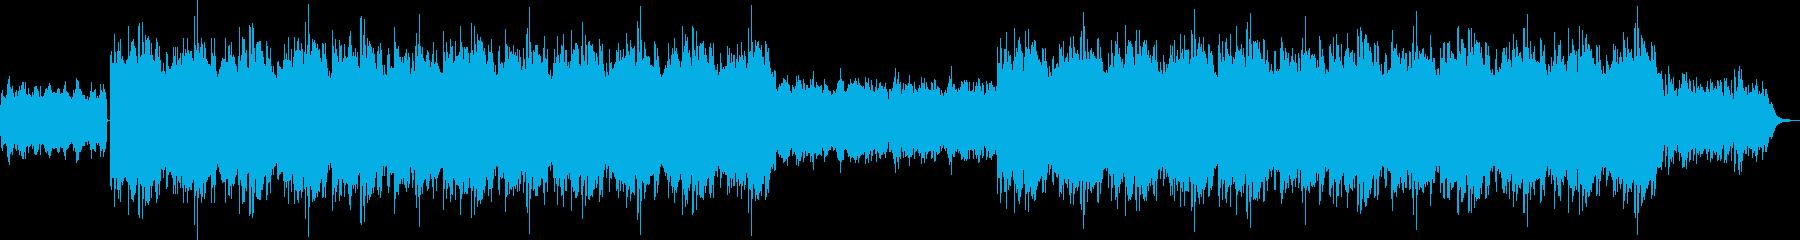 Japanese Chillhop 3の再生済みの波形